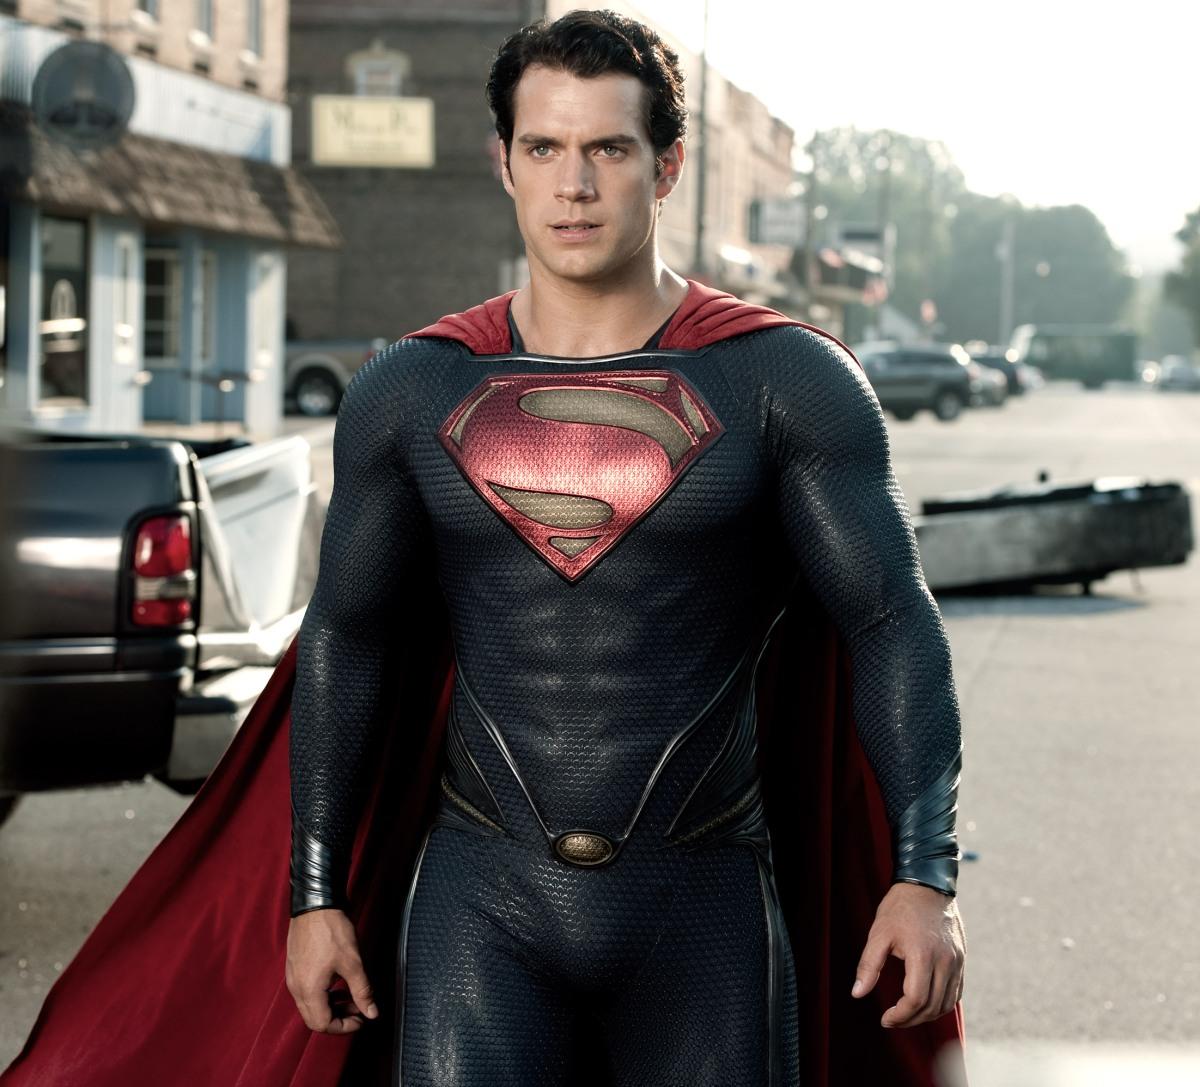 http://jeffreyklyles.files.wordpress.com/2013/06/man-of-steel-henry-cavill-as-superman.jpg?w=1200